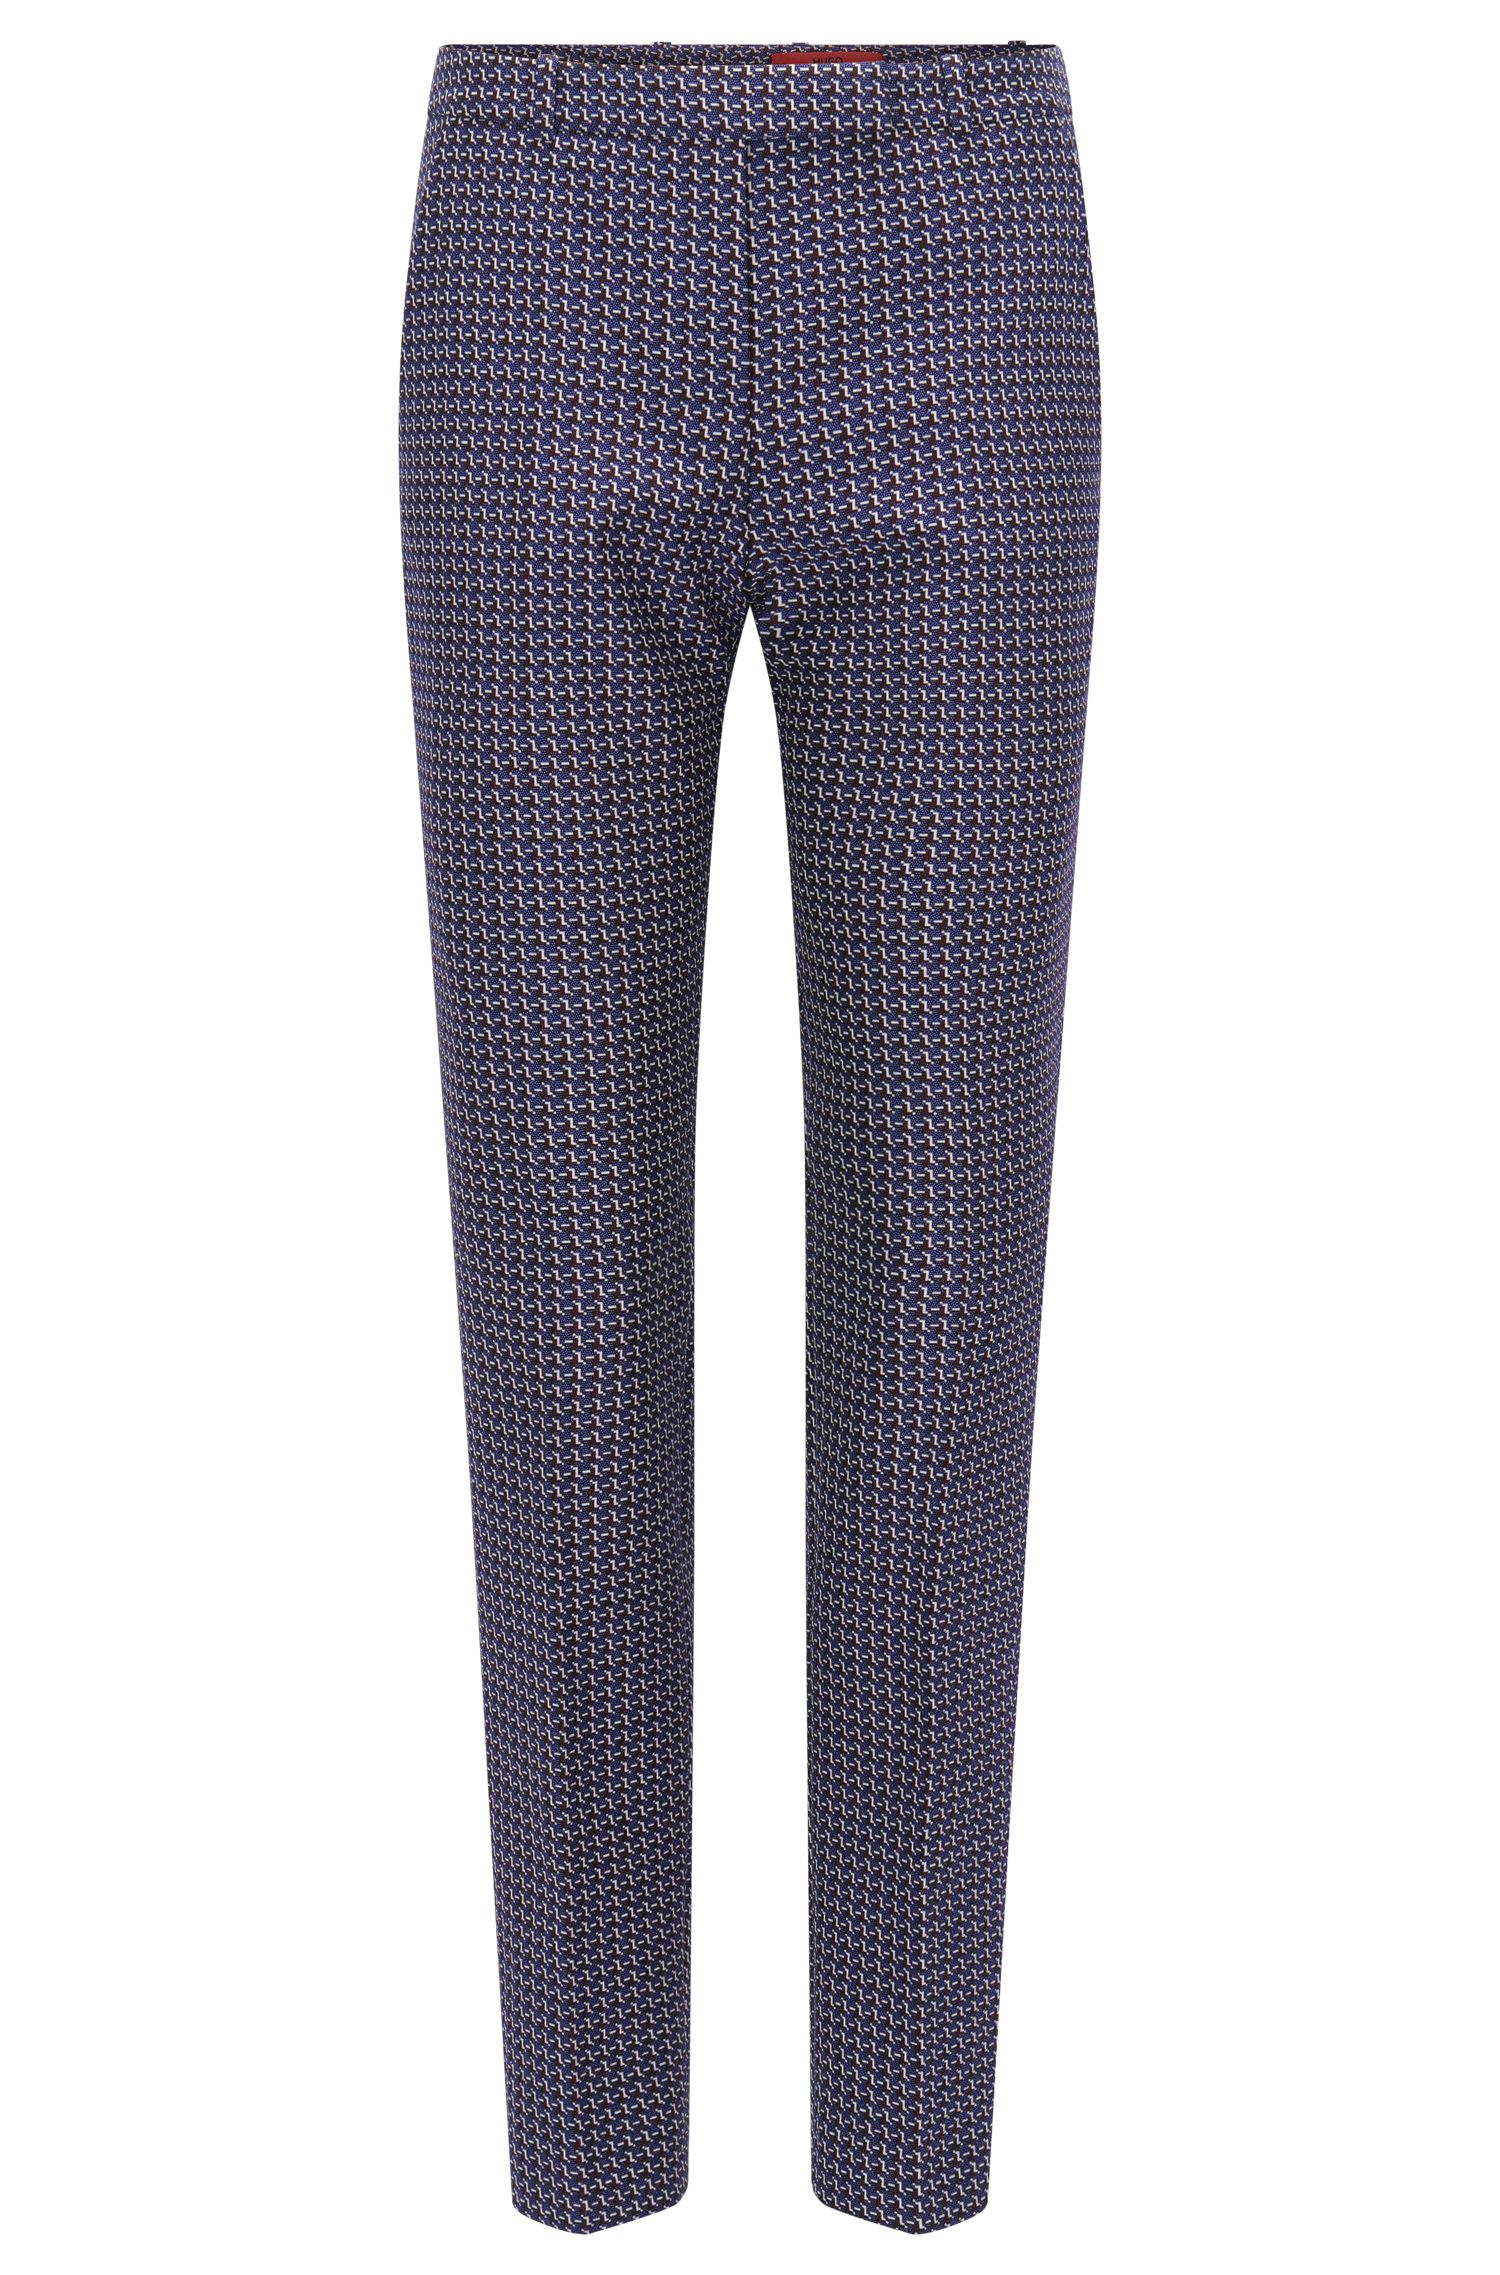 Pantalón regular fit en jacquard estampado